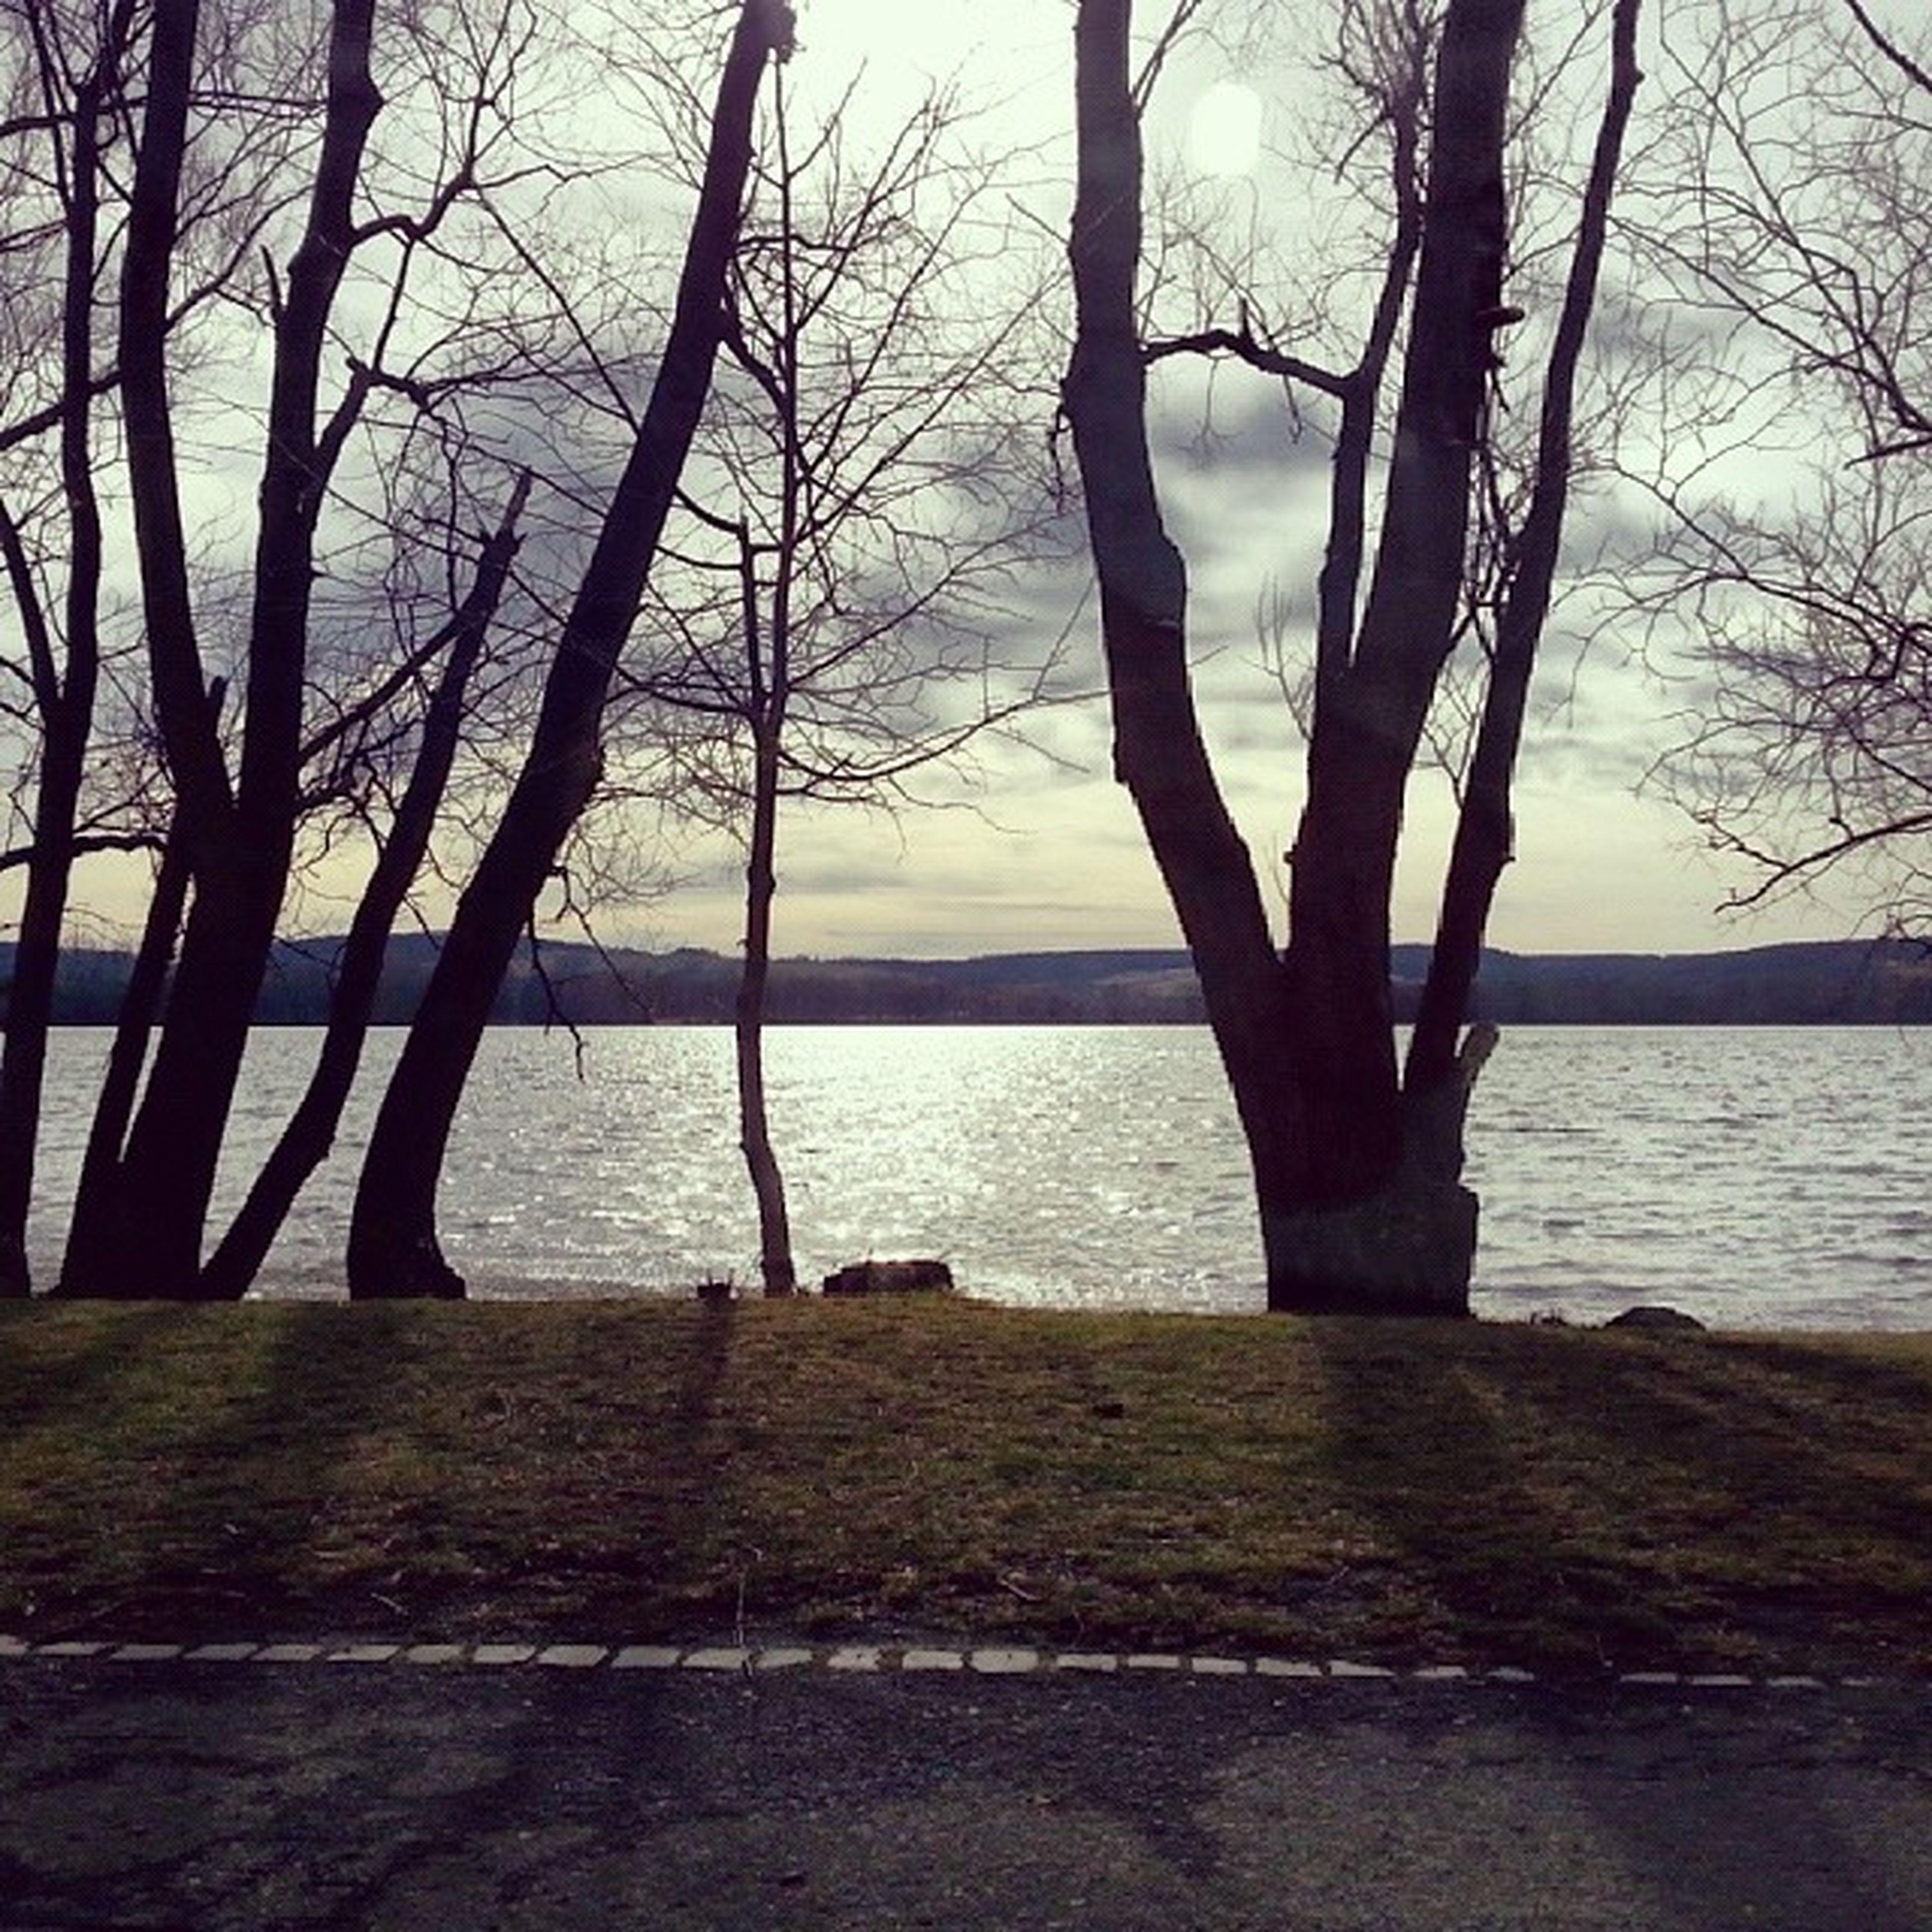 water, tree, tranquility, tranquil scene, scenics, branch, bare tree, beauty in nature, sky, nature, tree trunk, sea, lake, silhouette, horizon over water, idyllic, calm, no people, lakeshore, non-urban scene